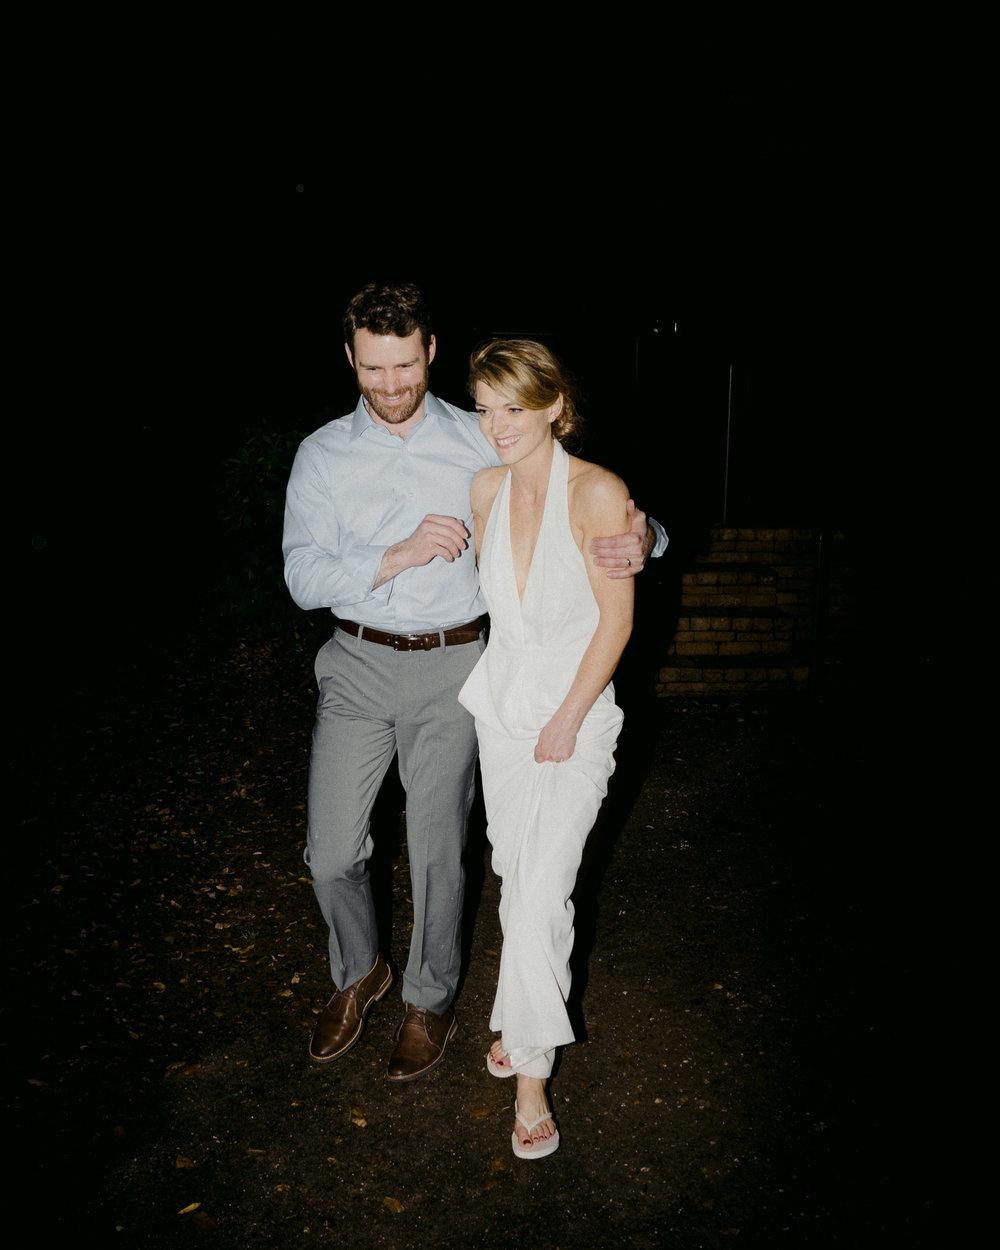 Matties-Green-Pastures-Austin-Wedding-2120.jpg